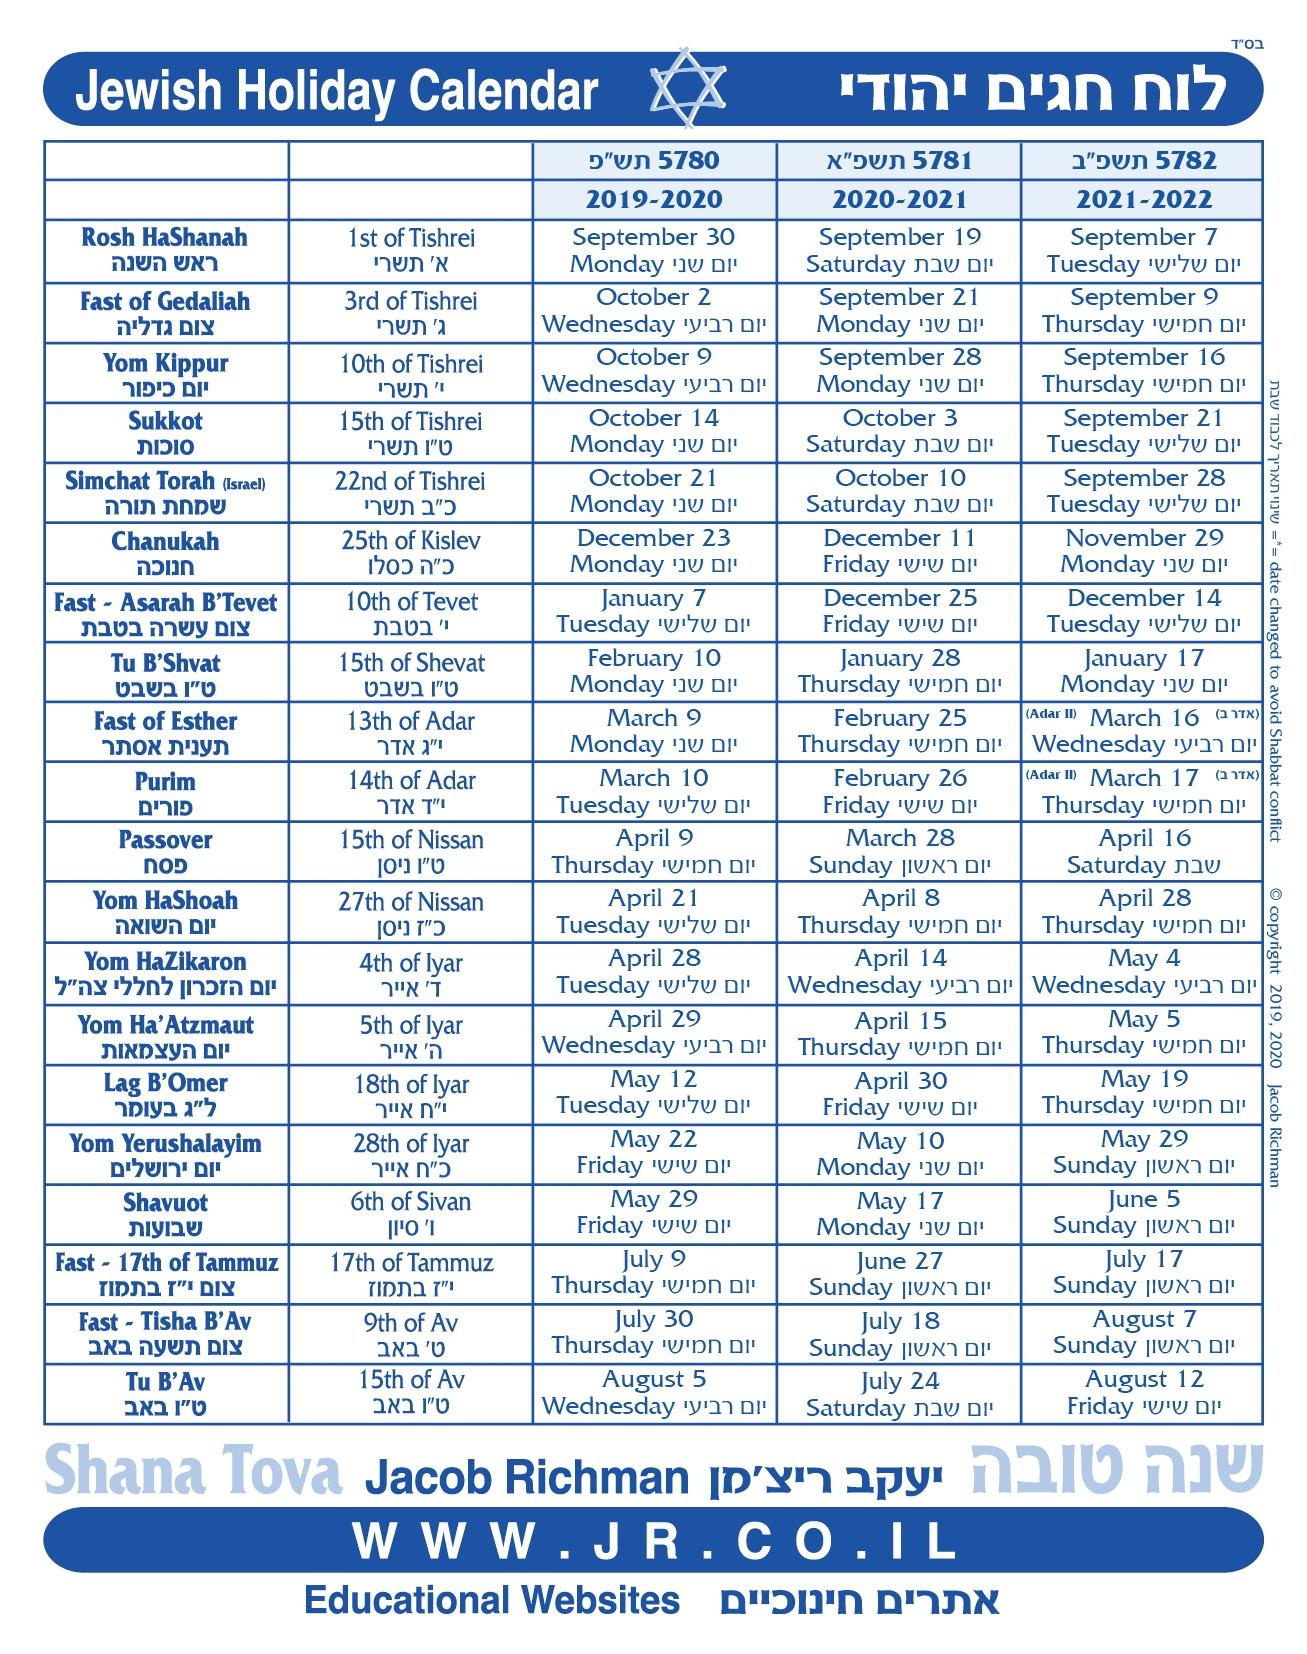 3 Year Jewish Holiday Calendar 5780 - 5782 / 2019 - 2022